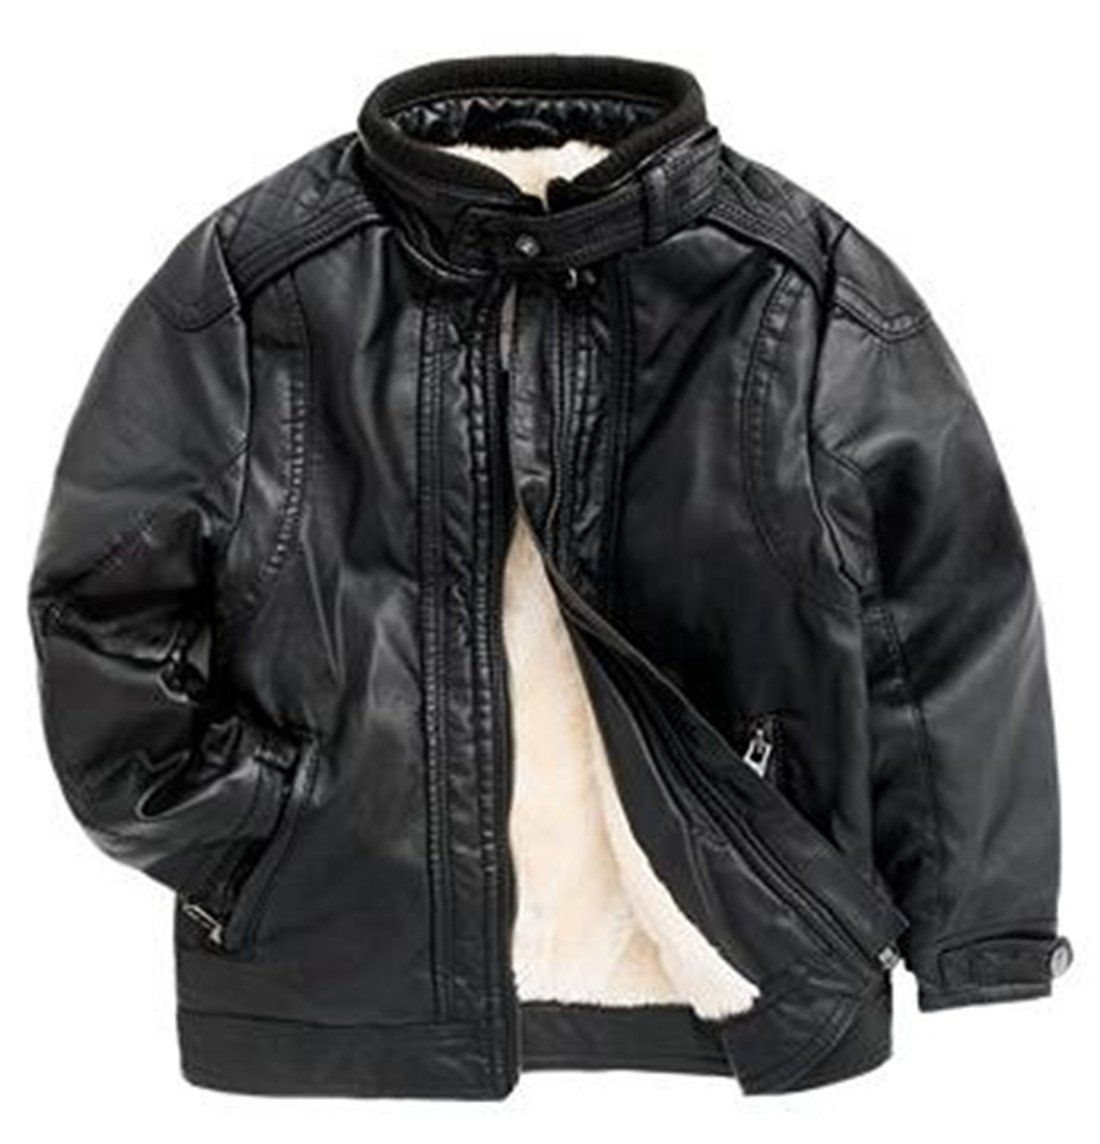 Yayu Kids Baby Boys Winter Warm Faux Leather Motorcycle